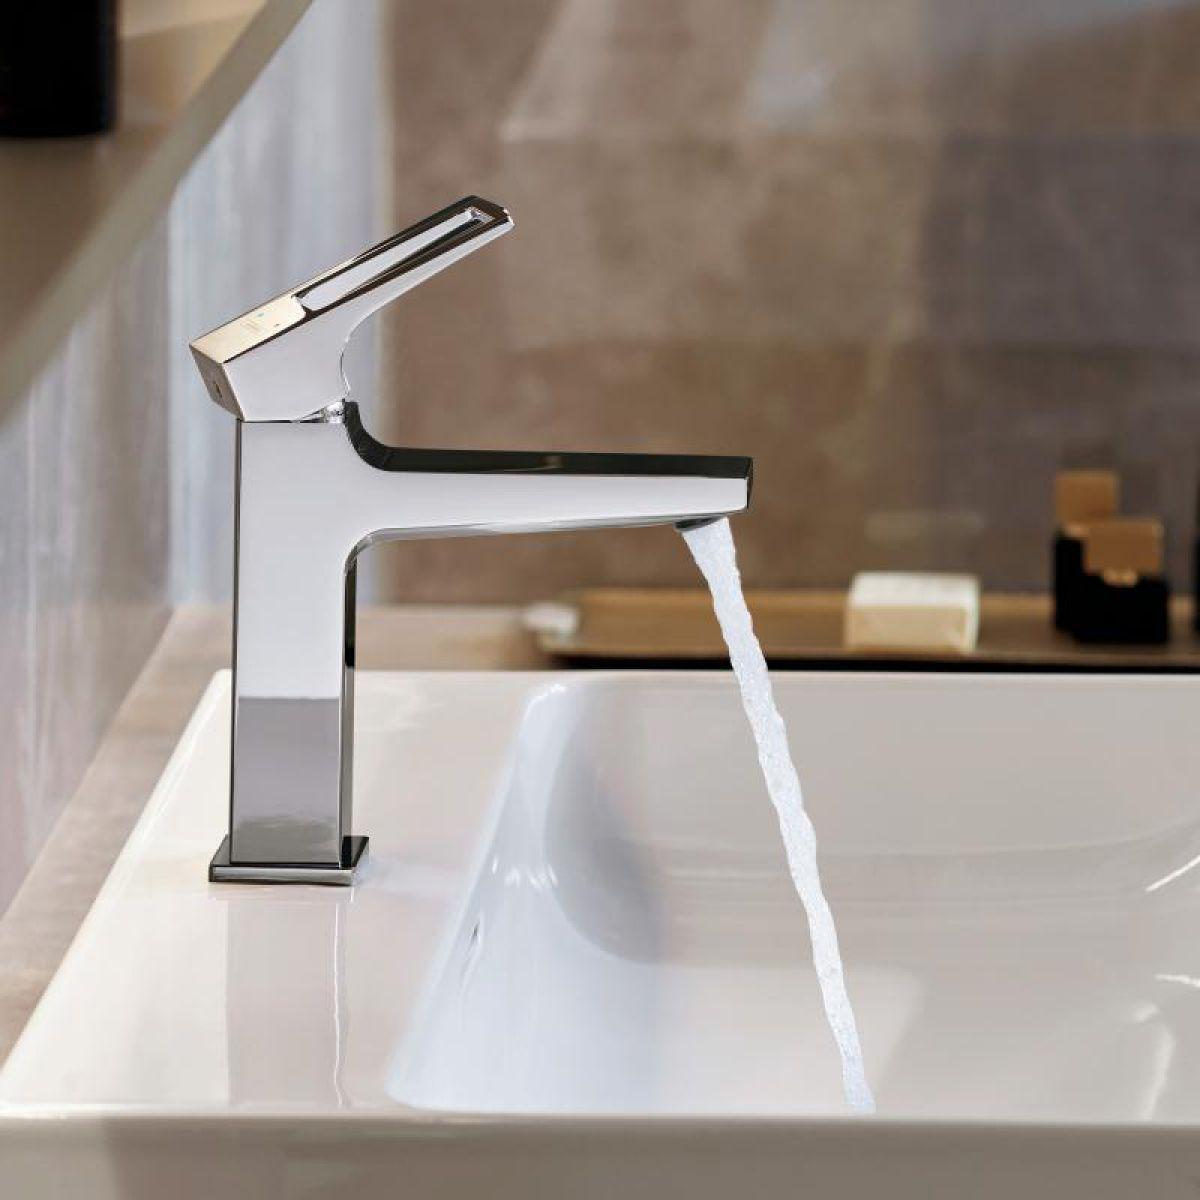 Hansgrohe Metropol 110 Basin Mixer with Loop Handle : UK Bathrooms